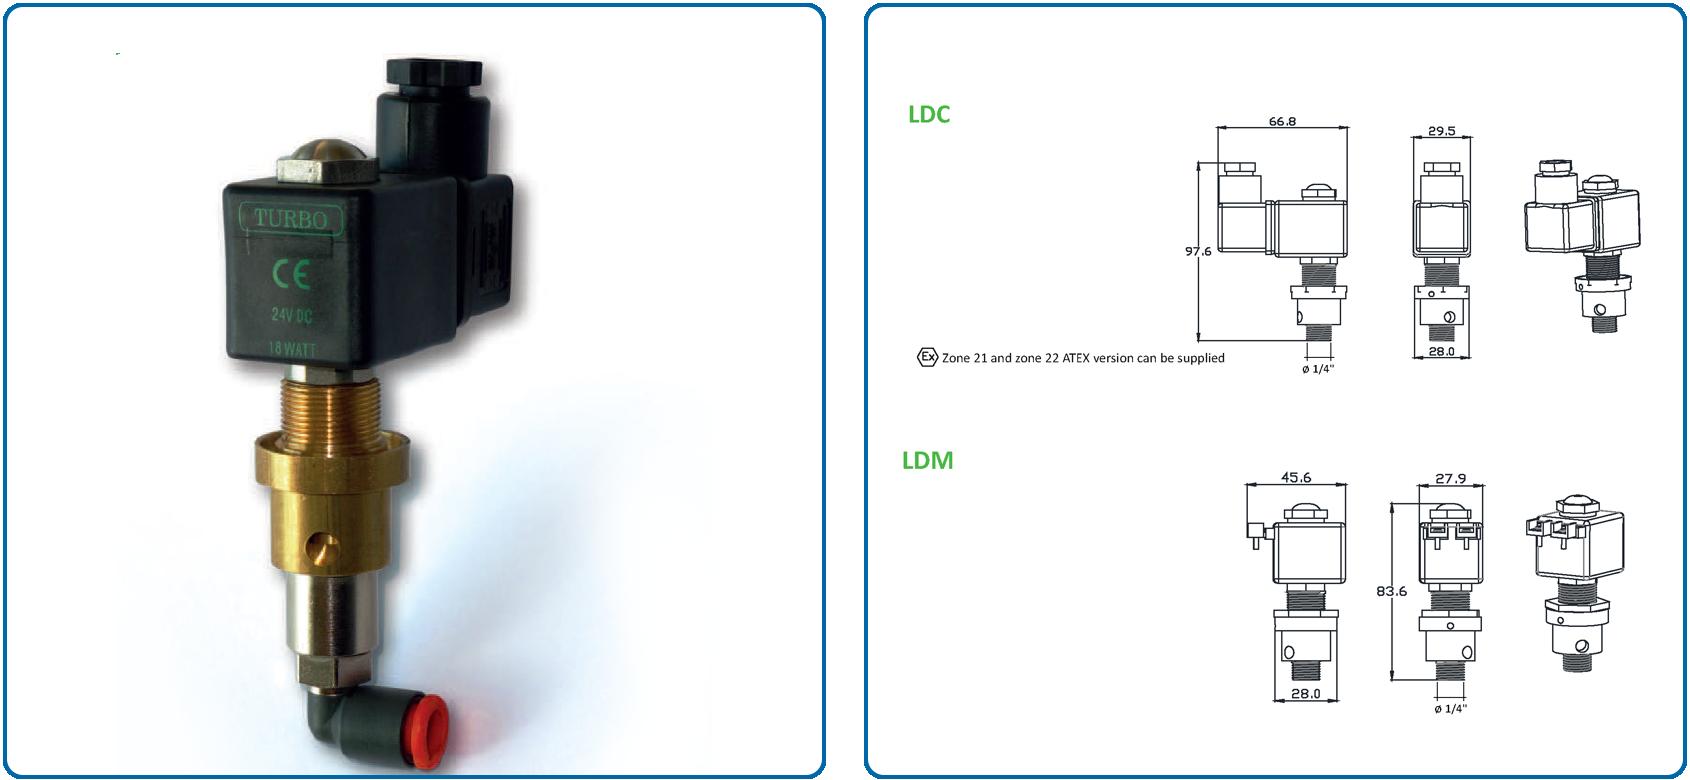 LDM-&-LDC-REMOTE-PILOTS